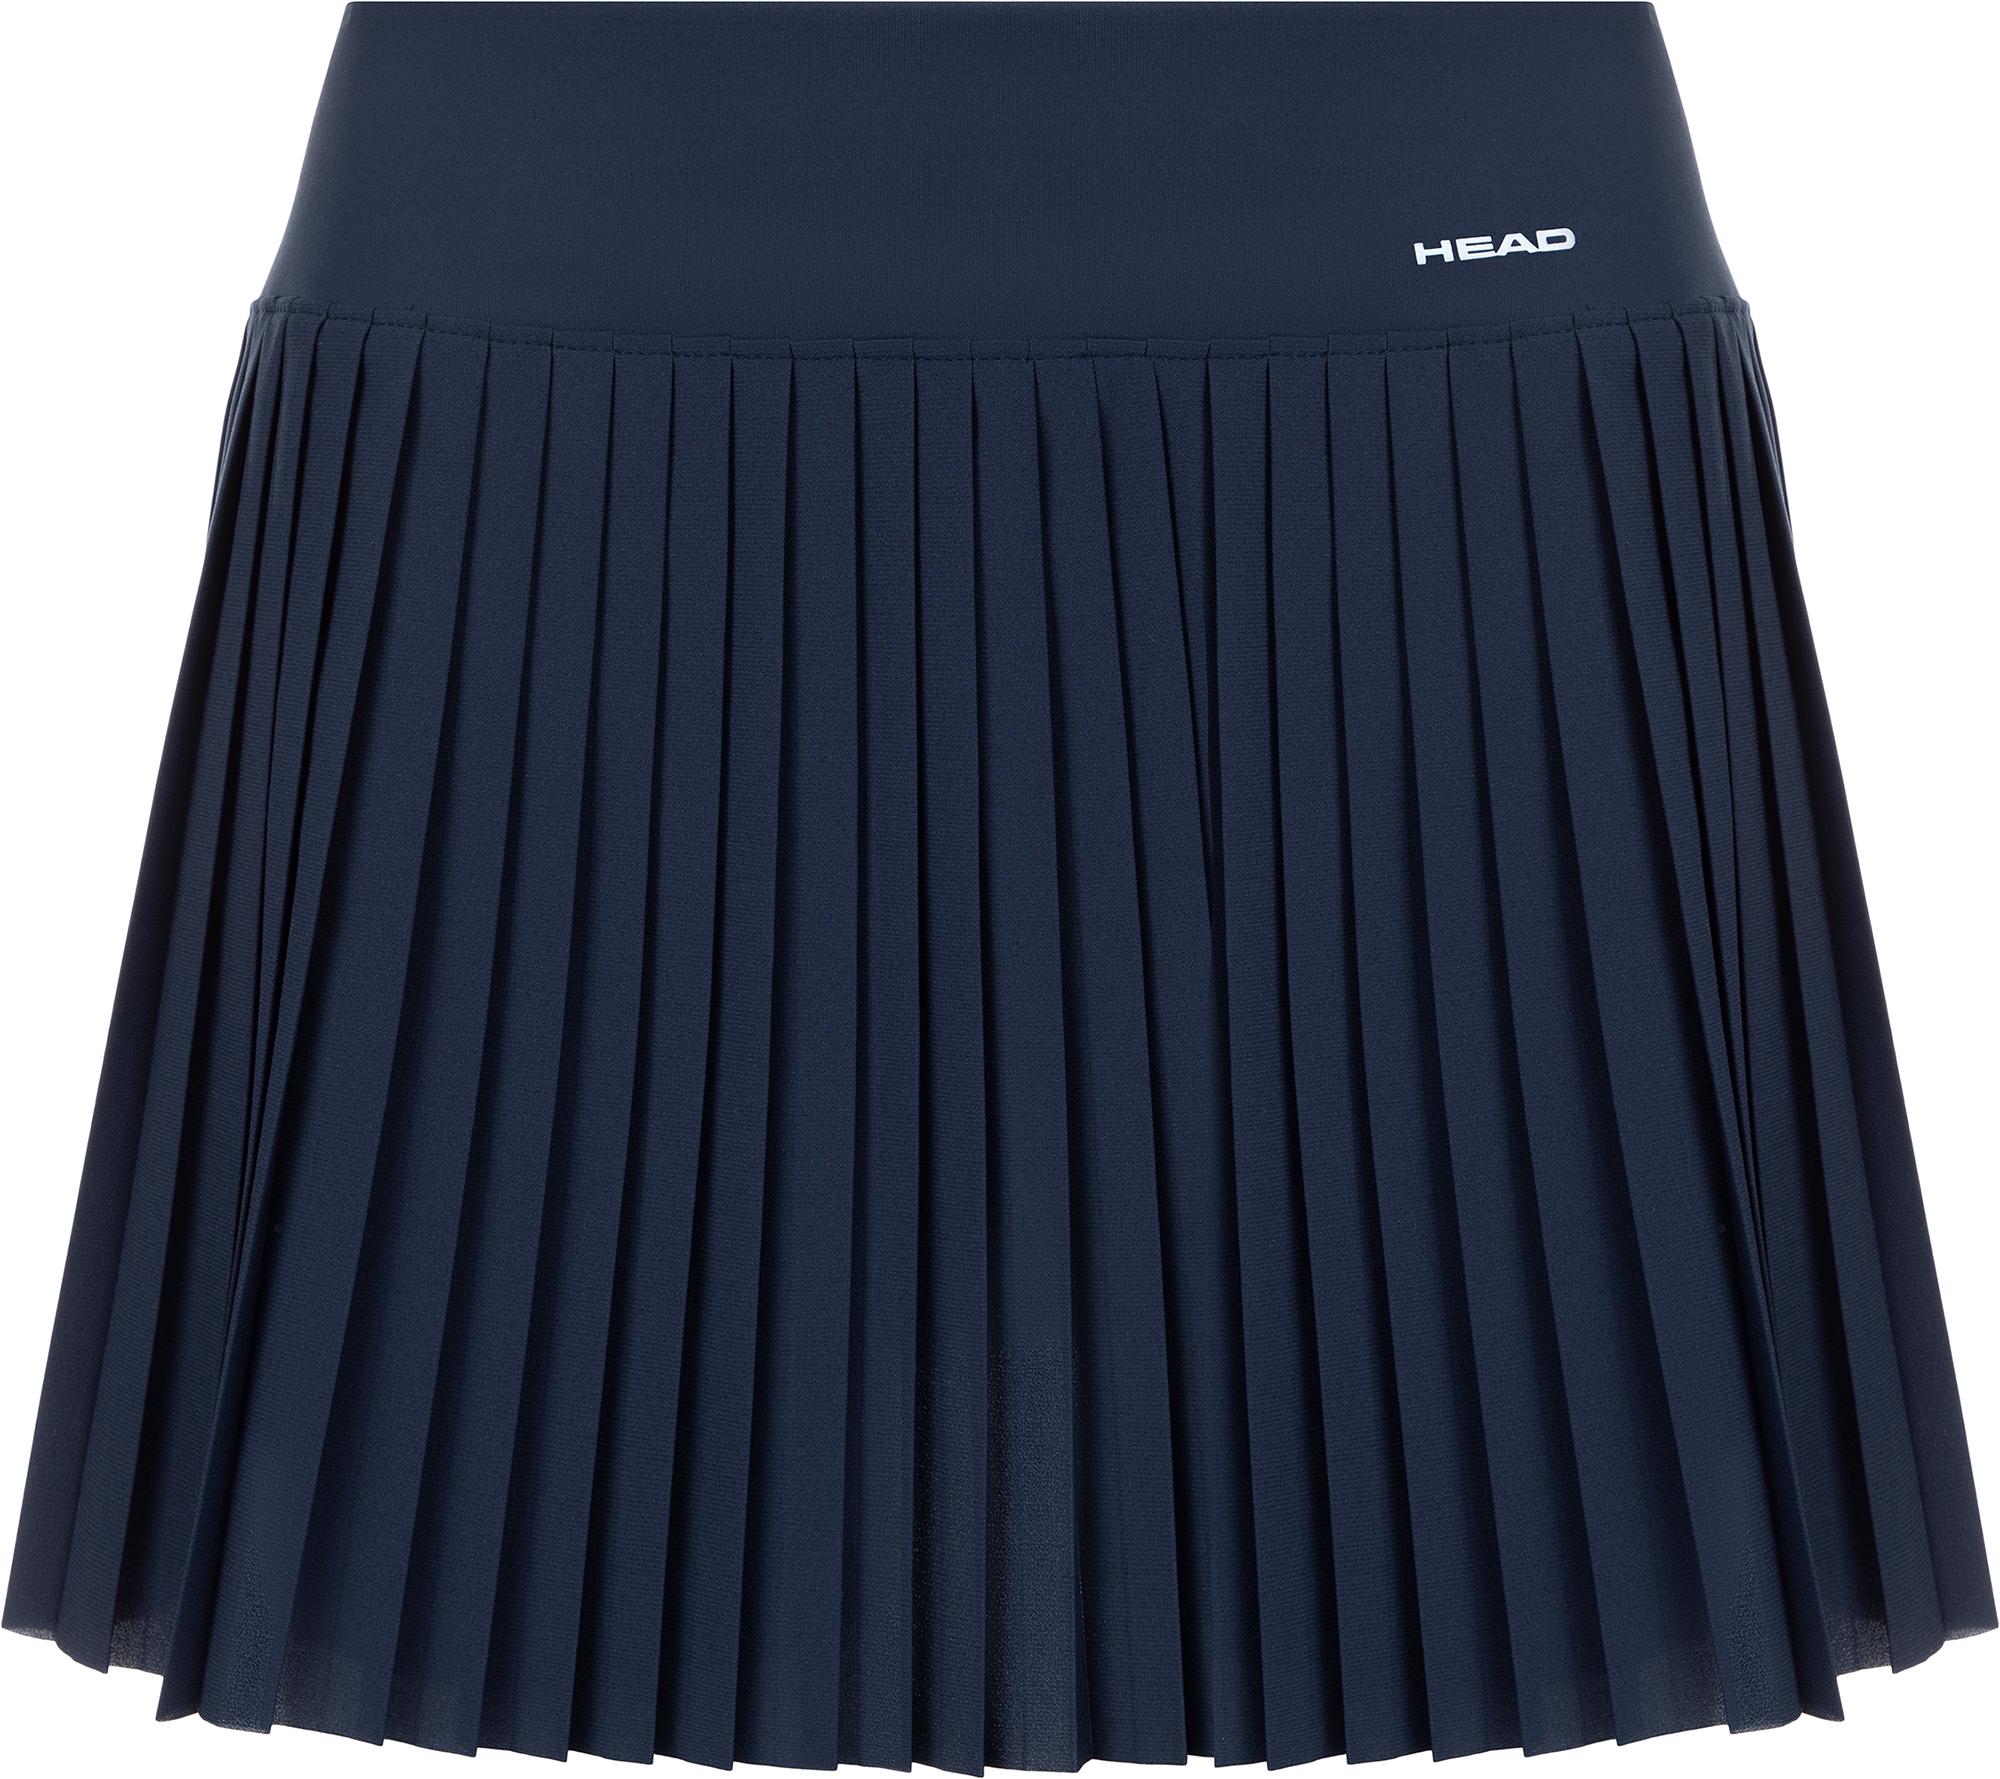 Head Юбка-шорты женская Head Perf, размер 42-44